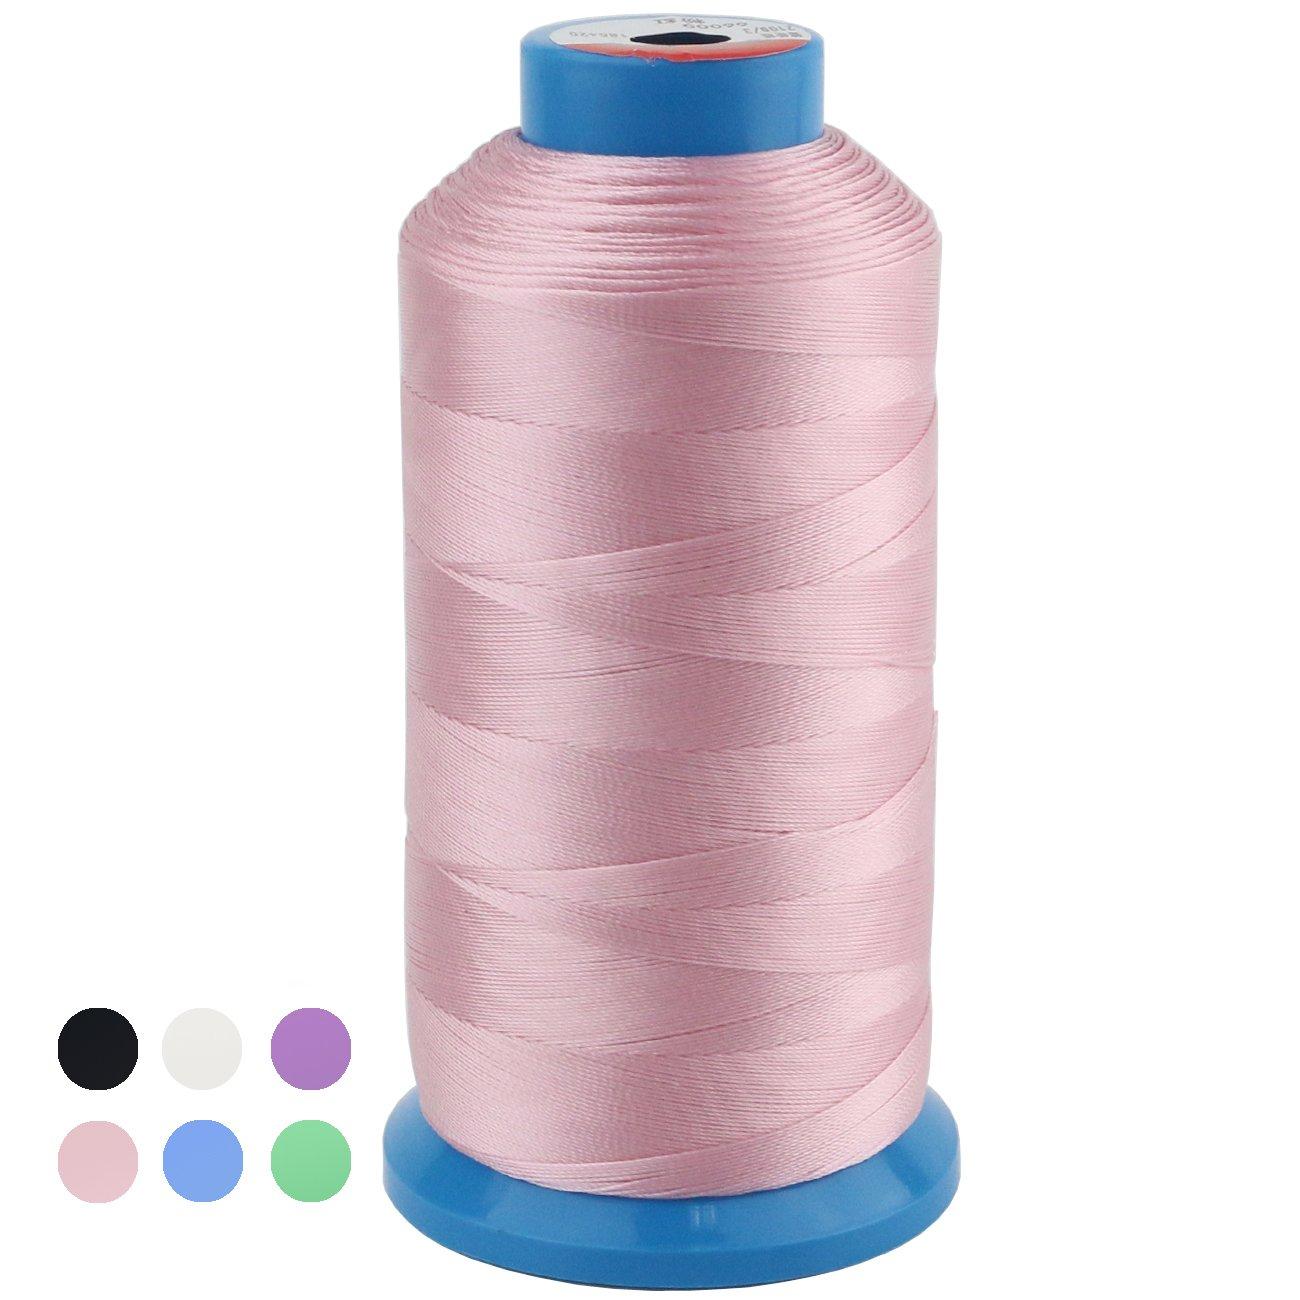 Ogrmar White Bonded Nylon Sewing Thread 1500 Yard Size T70#69 (White)